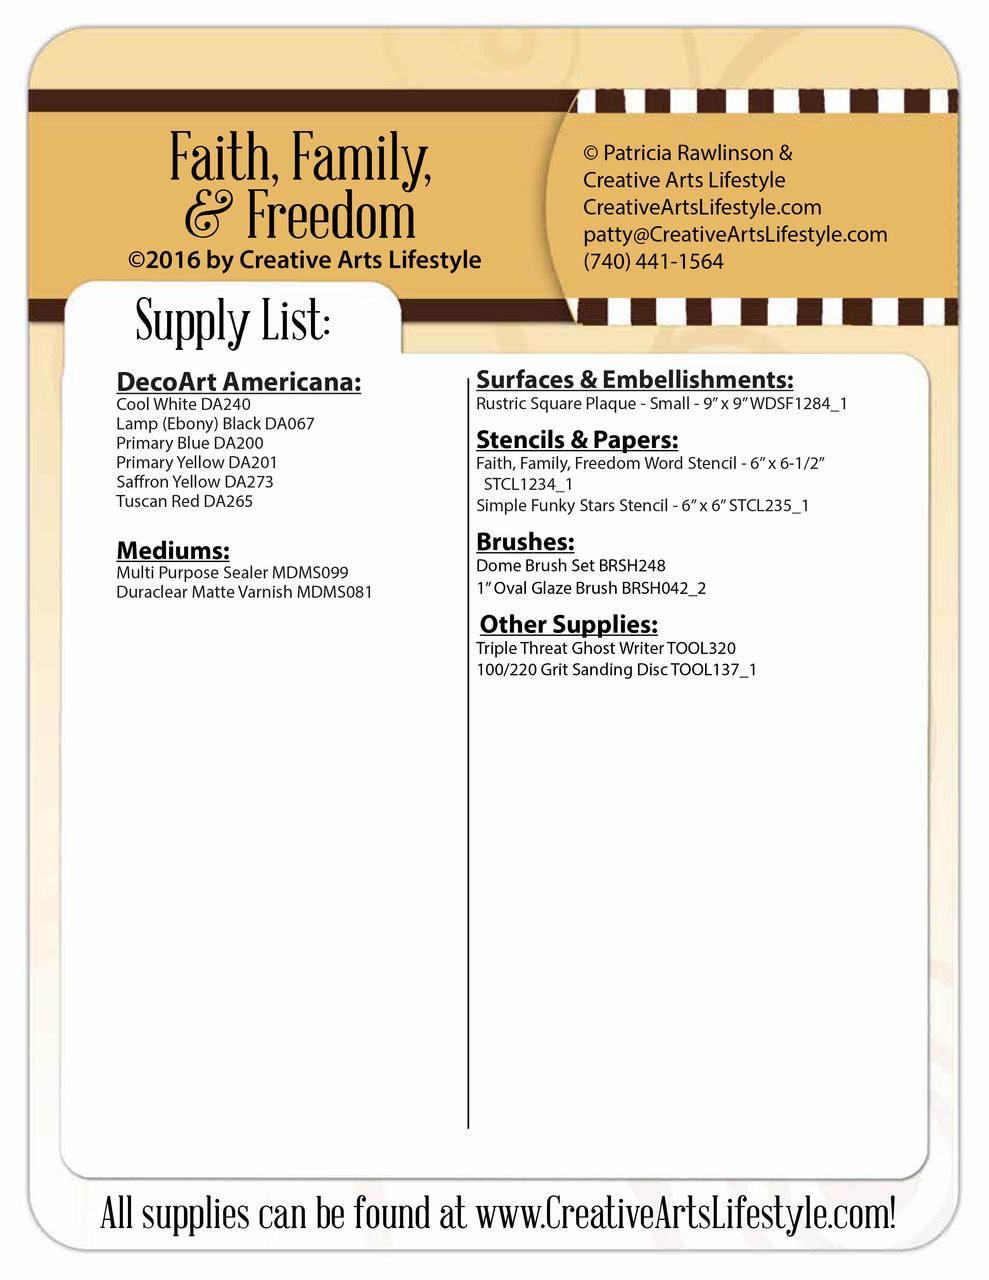 Faith, Family, & Freedom Pattern Packet - Patricia Rawlinson